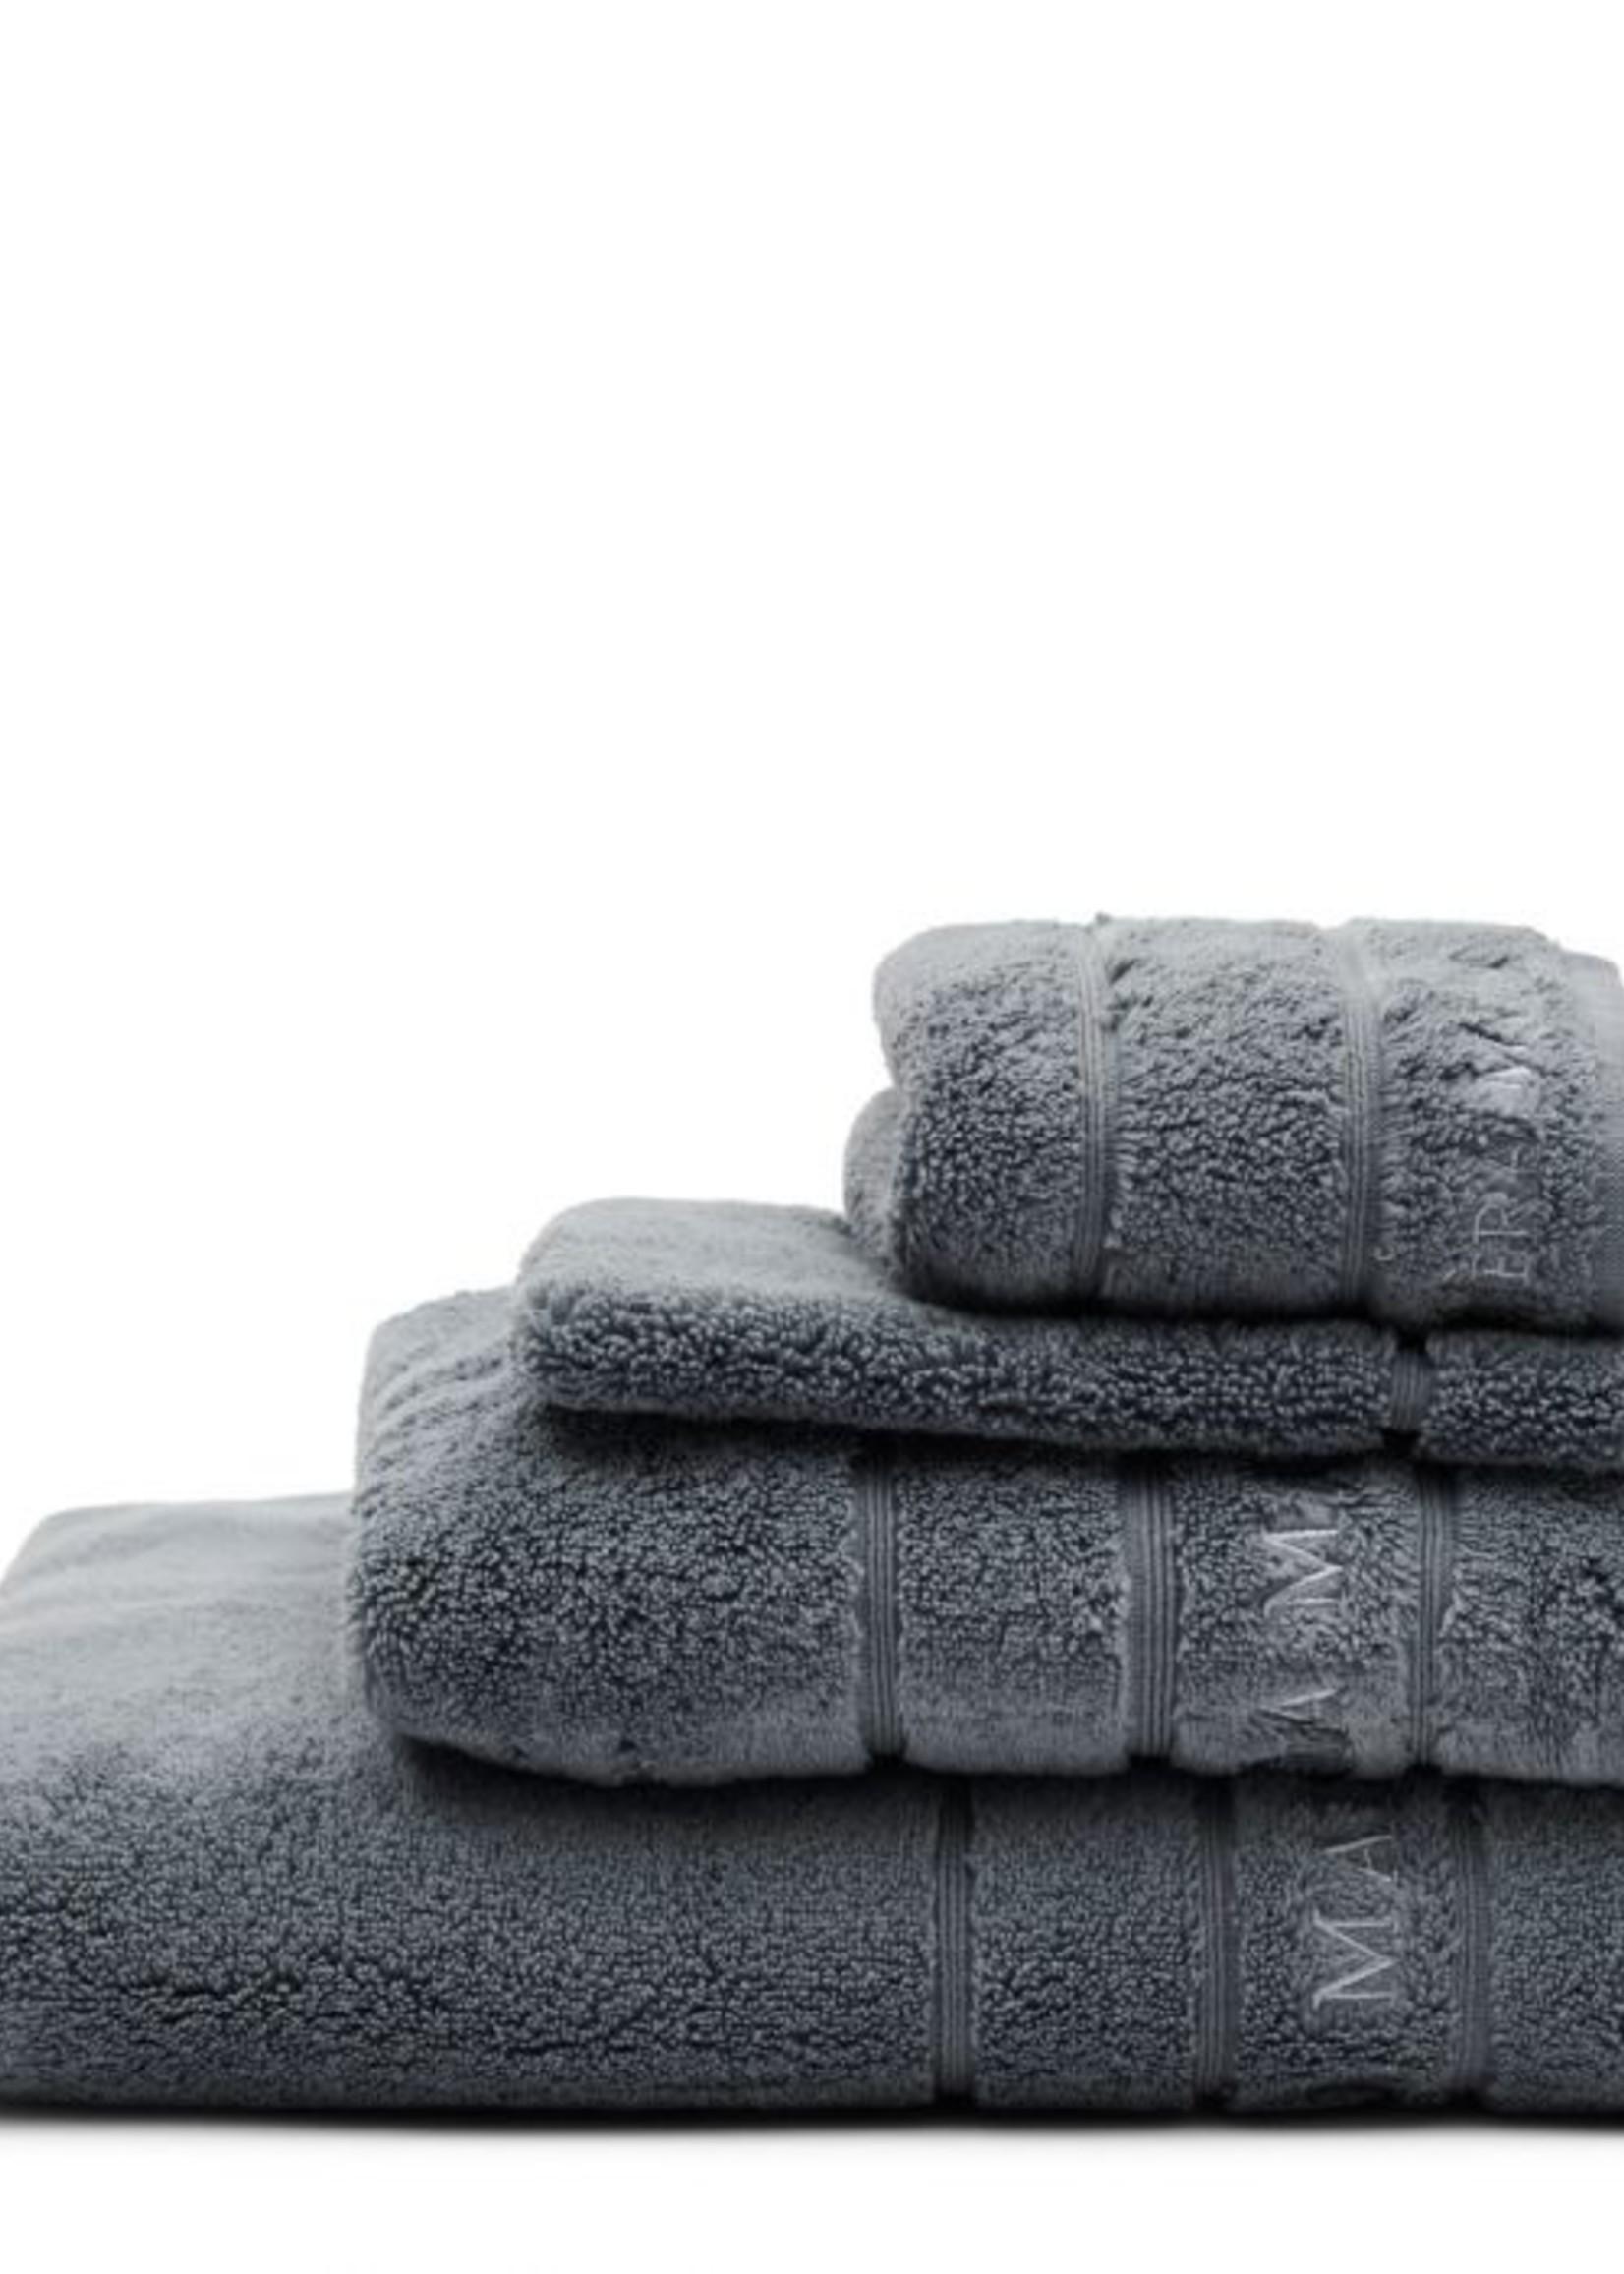 Riviera Maison RM Hotel Towel anthracite 140x70